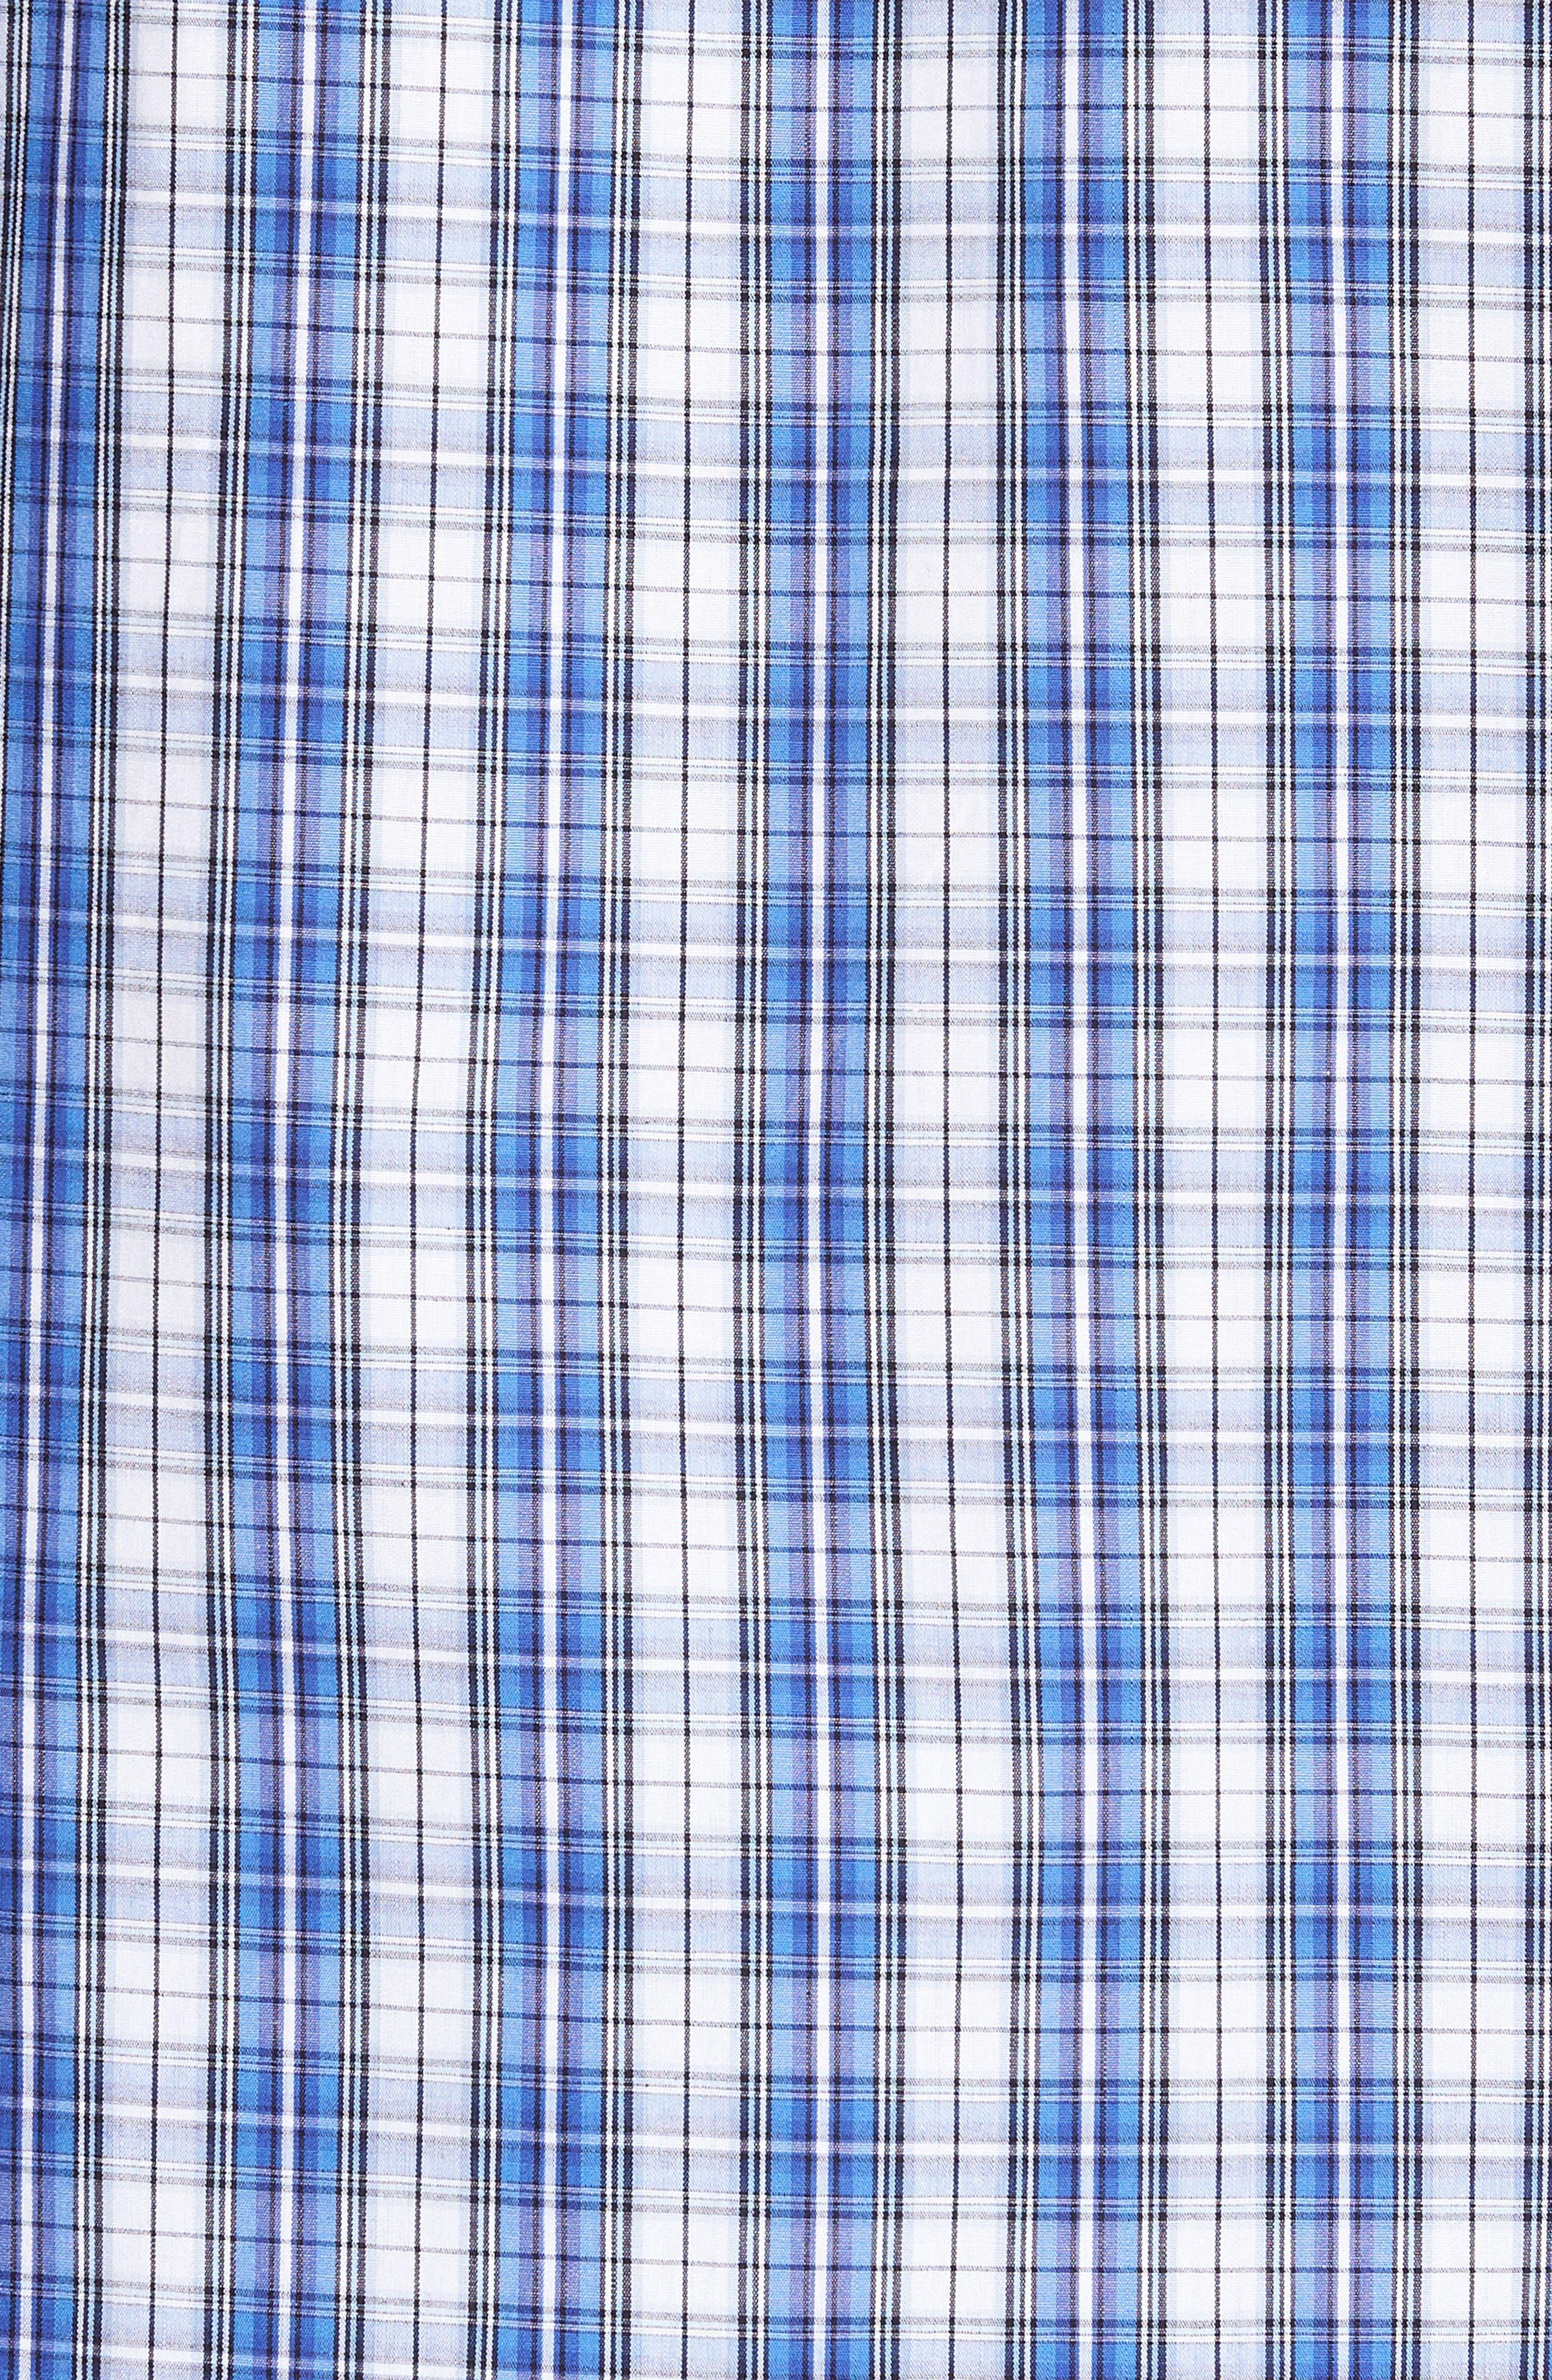 Cotton Pajama Shirt,                             Alternate thumbnail 5, color,                             428